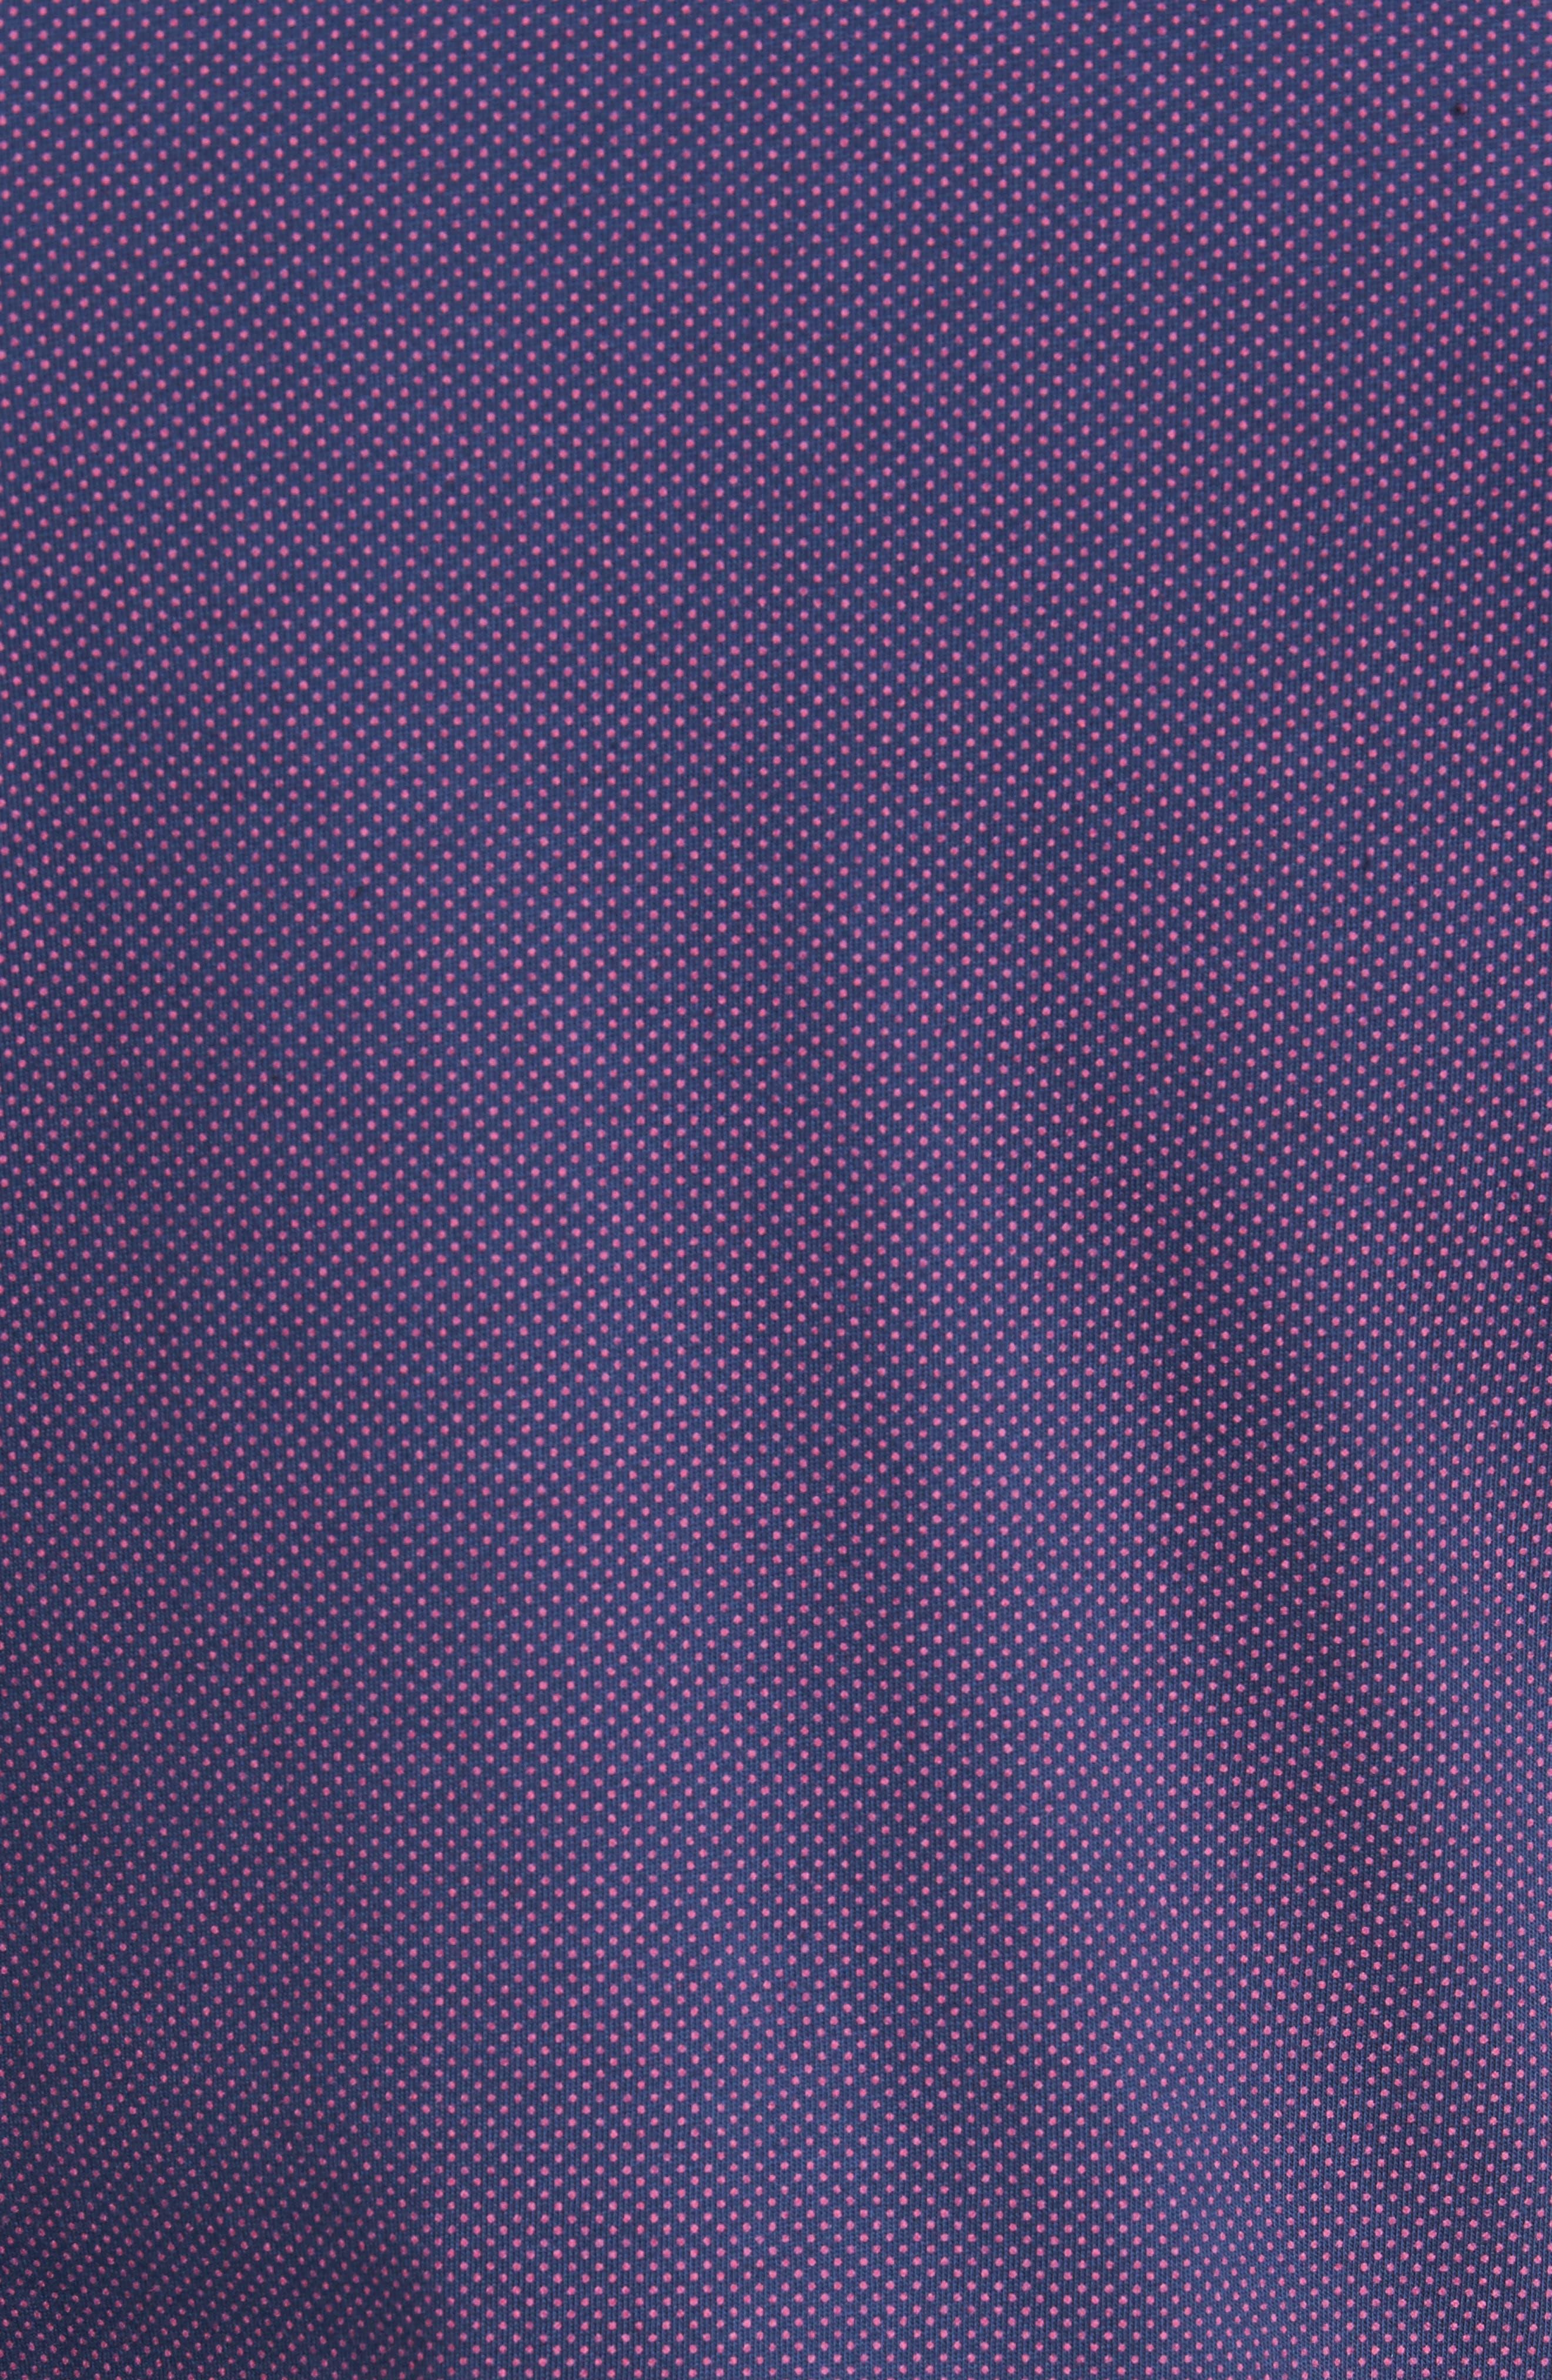 Slim Fit Micro Dot Knit Sport Shirt,                             Alternate thumbnail 5, color,                             001